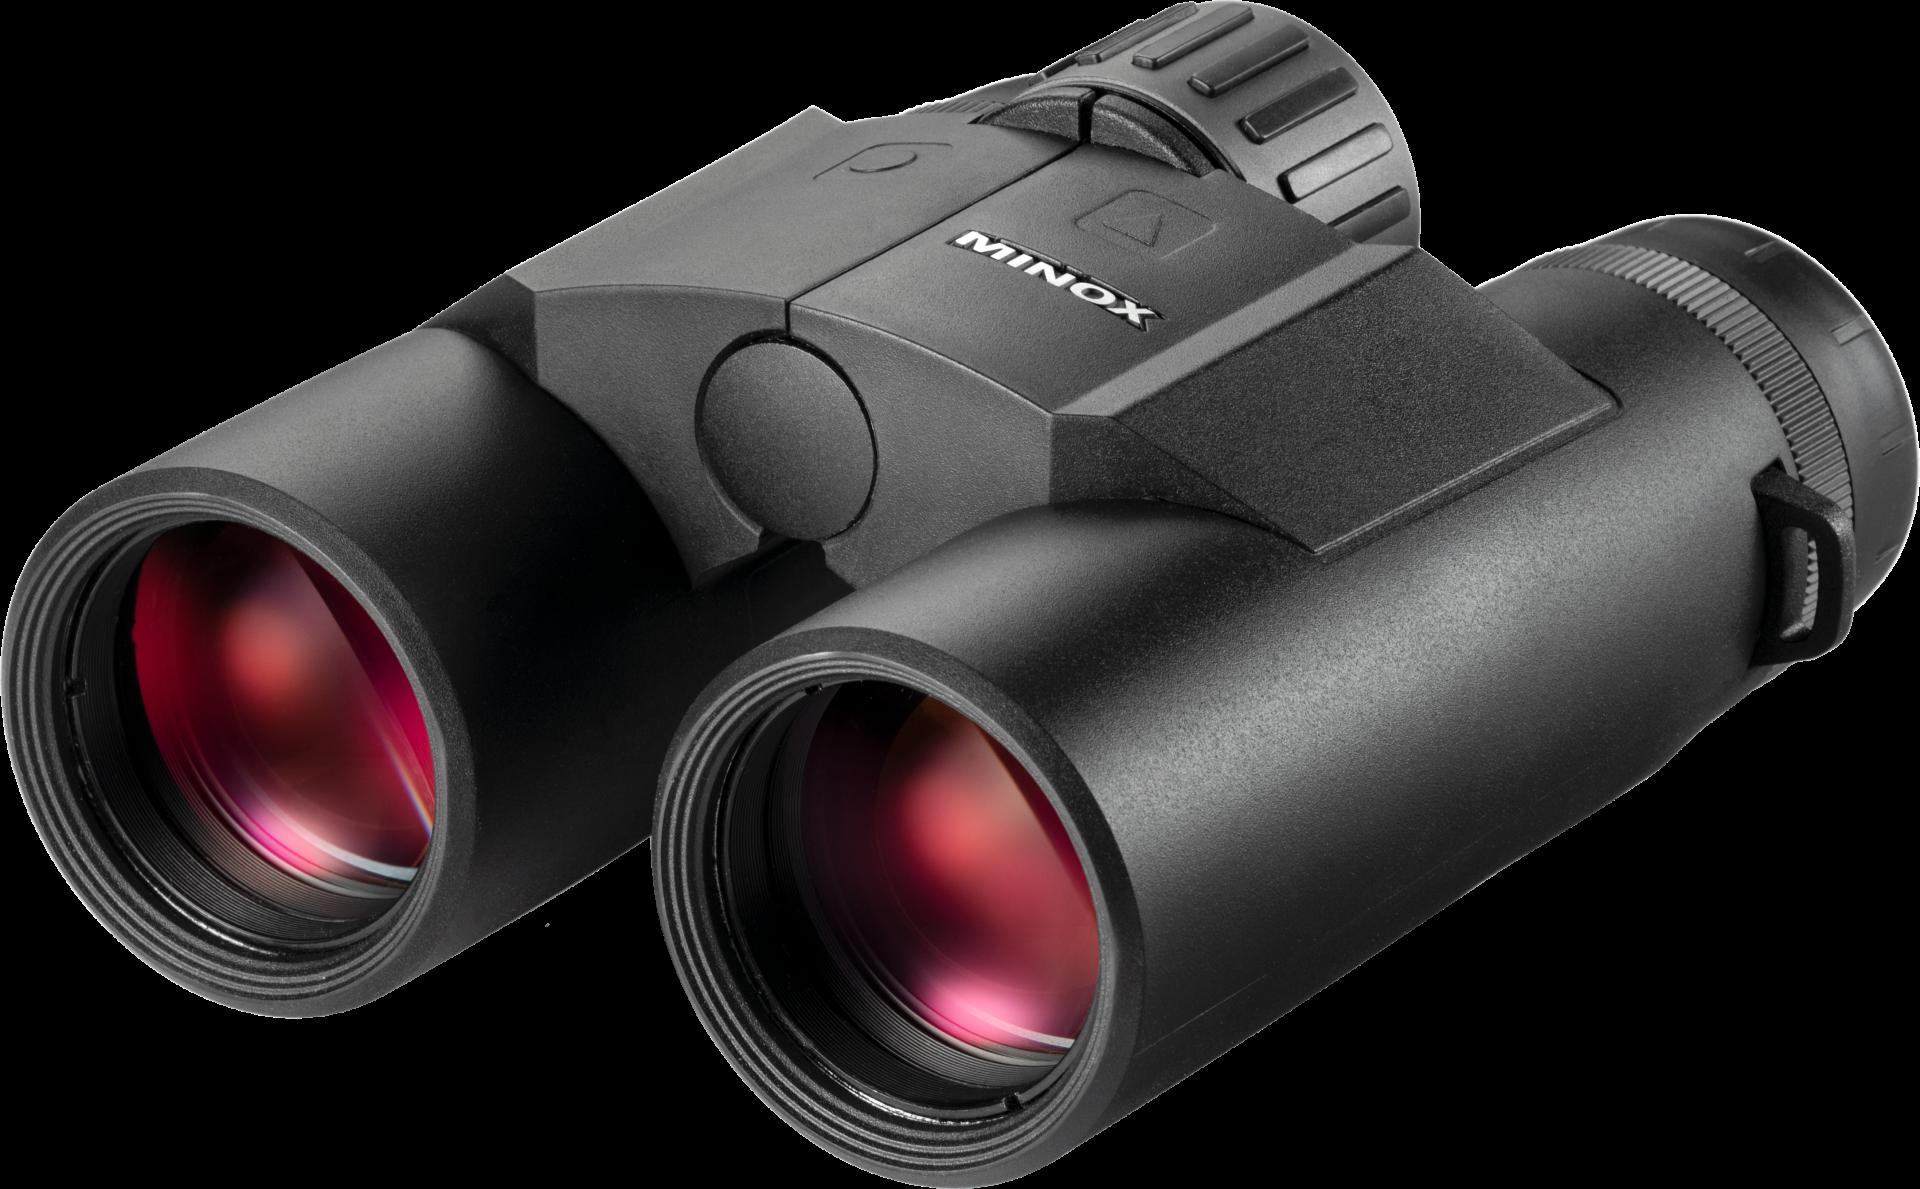 Minox Binocular X-range 10x42